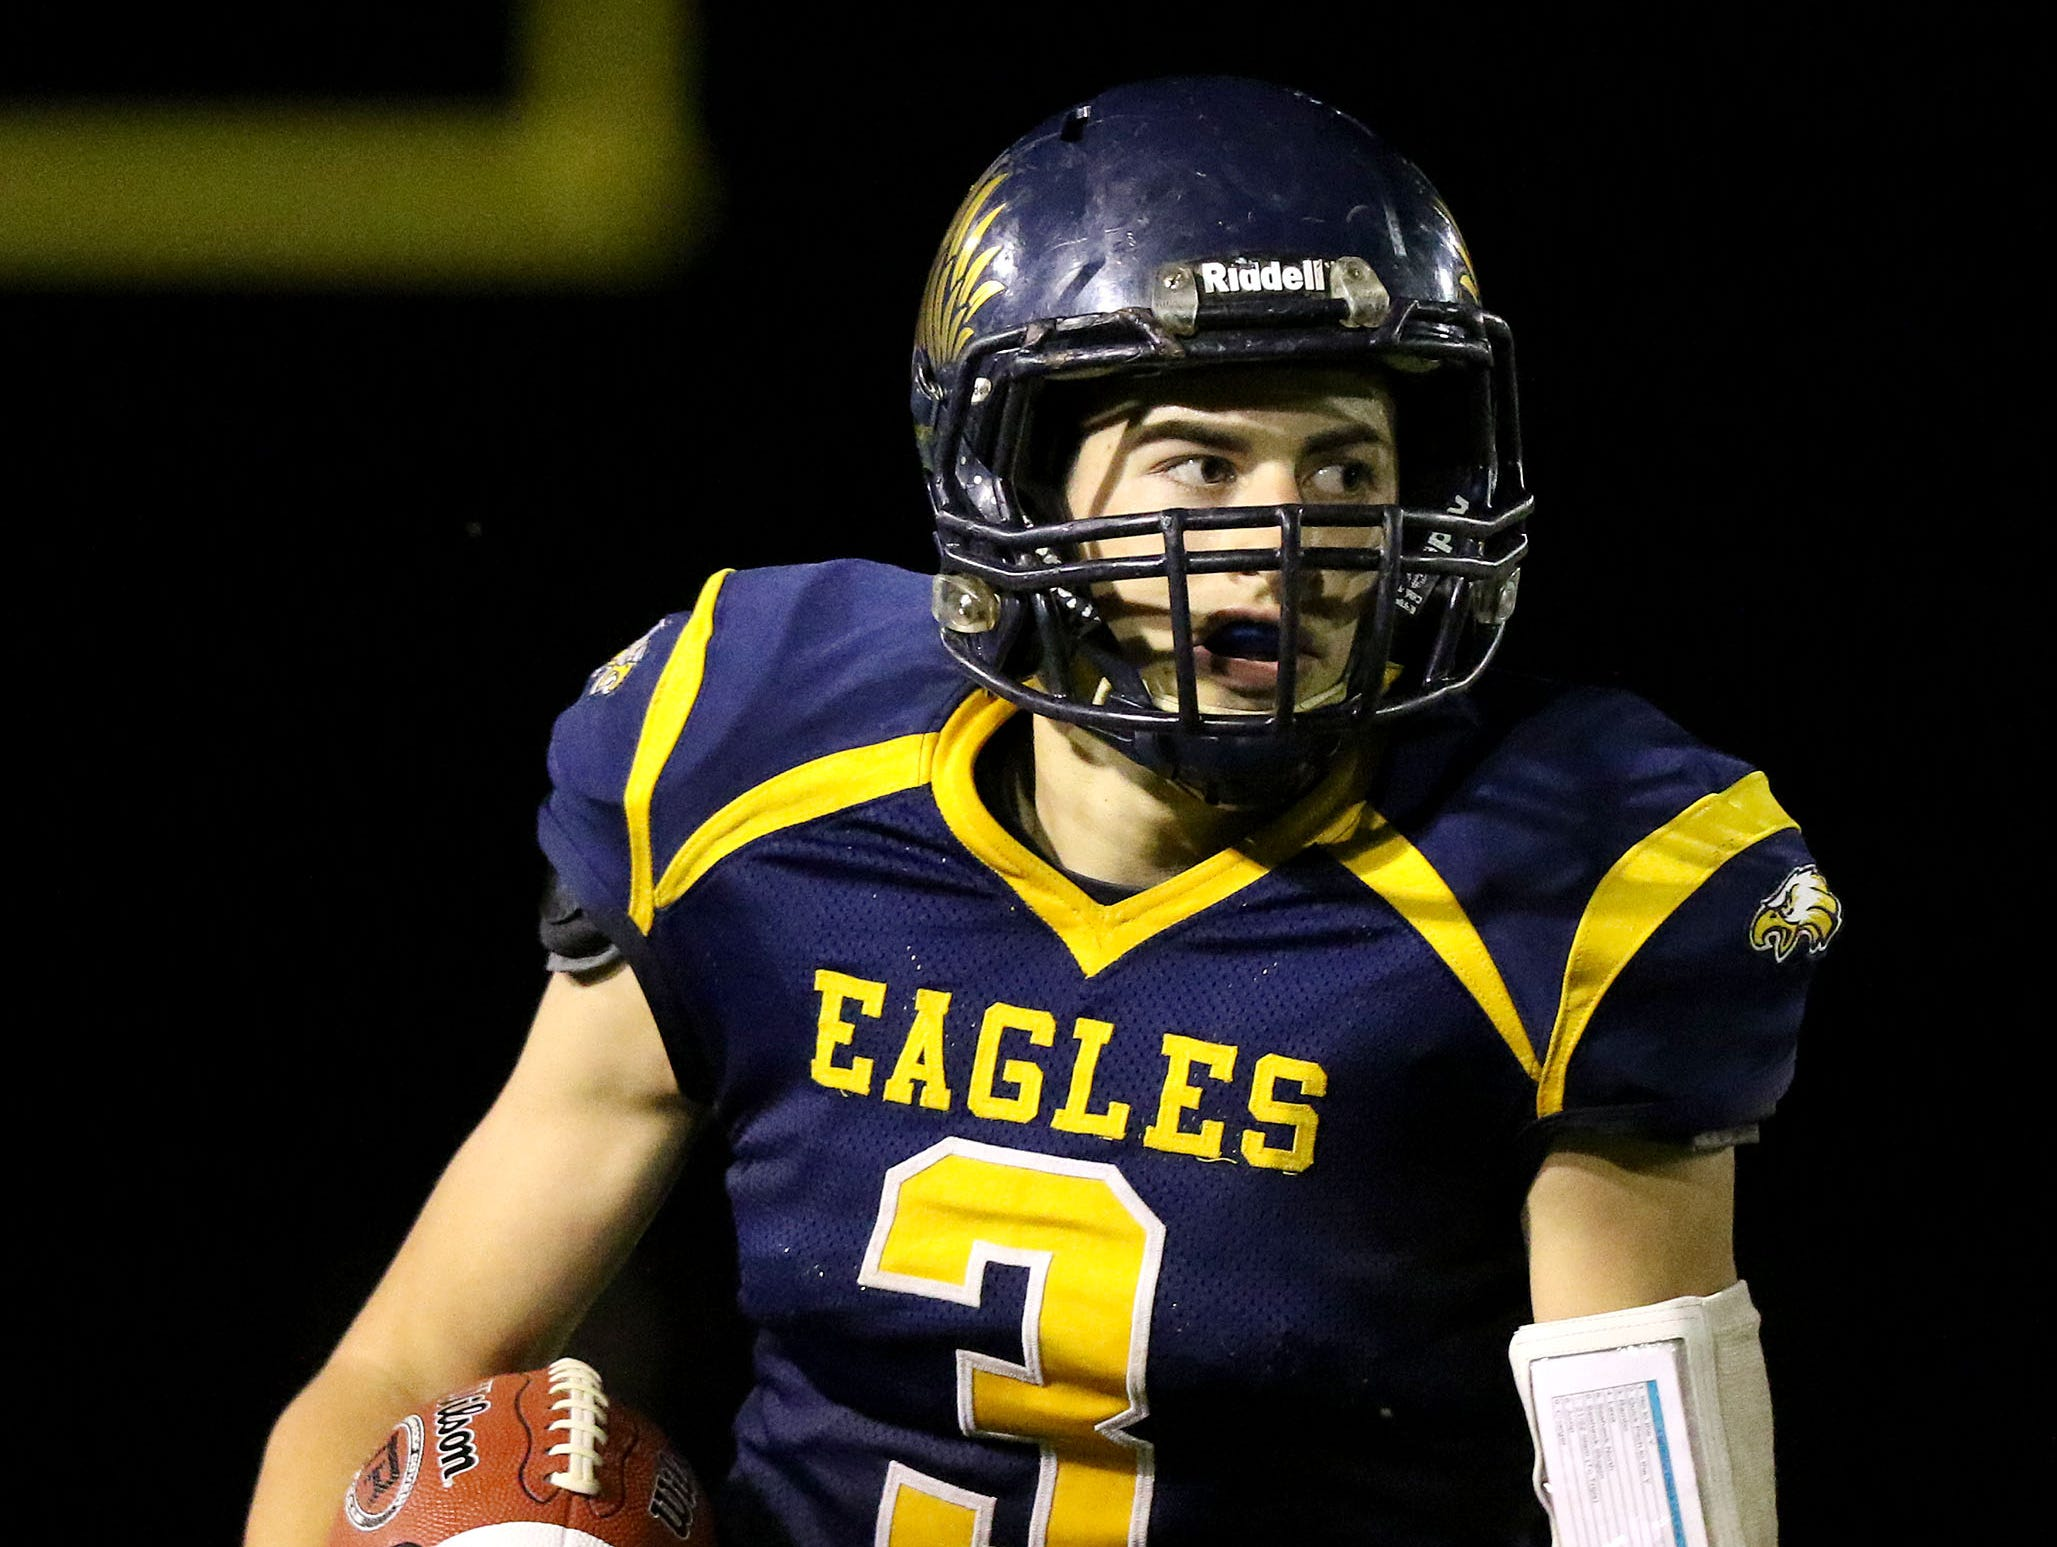 Stayton High School's Ben Diehl (3) runs the ball against Newport on Friday, Sept. 25, 2015, in Stayton, Ore.